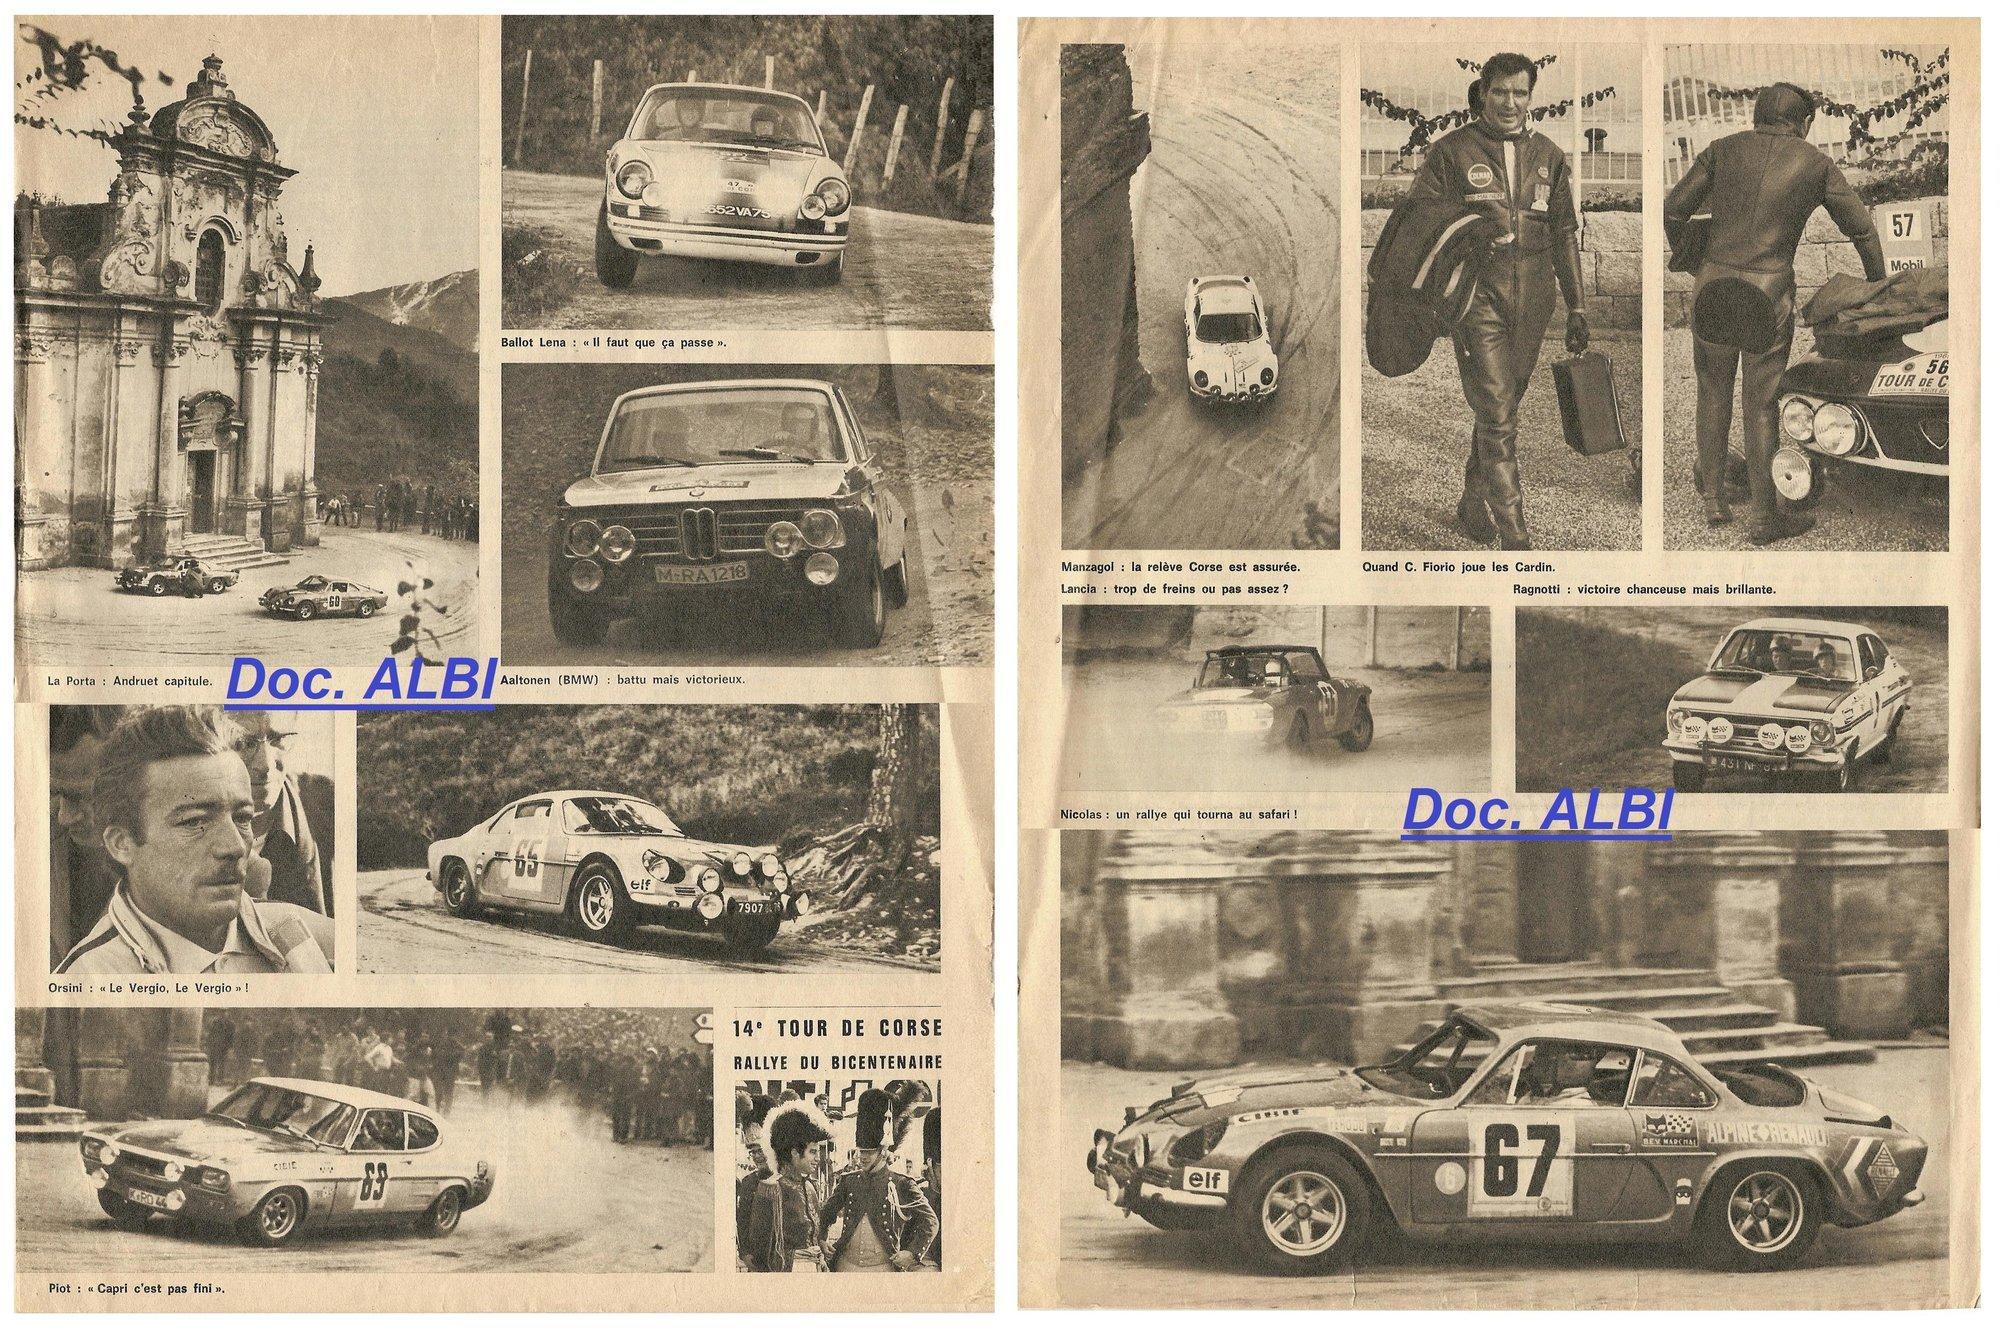 1969-Eu10-Tour-Corse-A-04-05-a.thumb.jpg.378da2df8c52d4362d3a43812342bf34.jpg